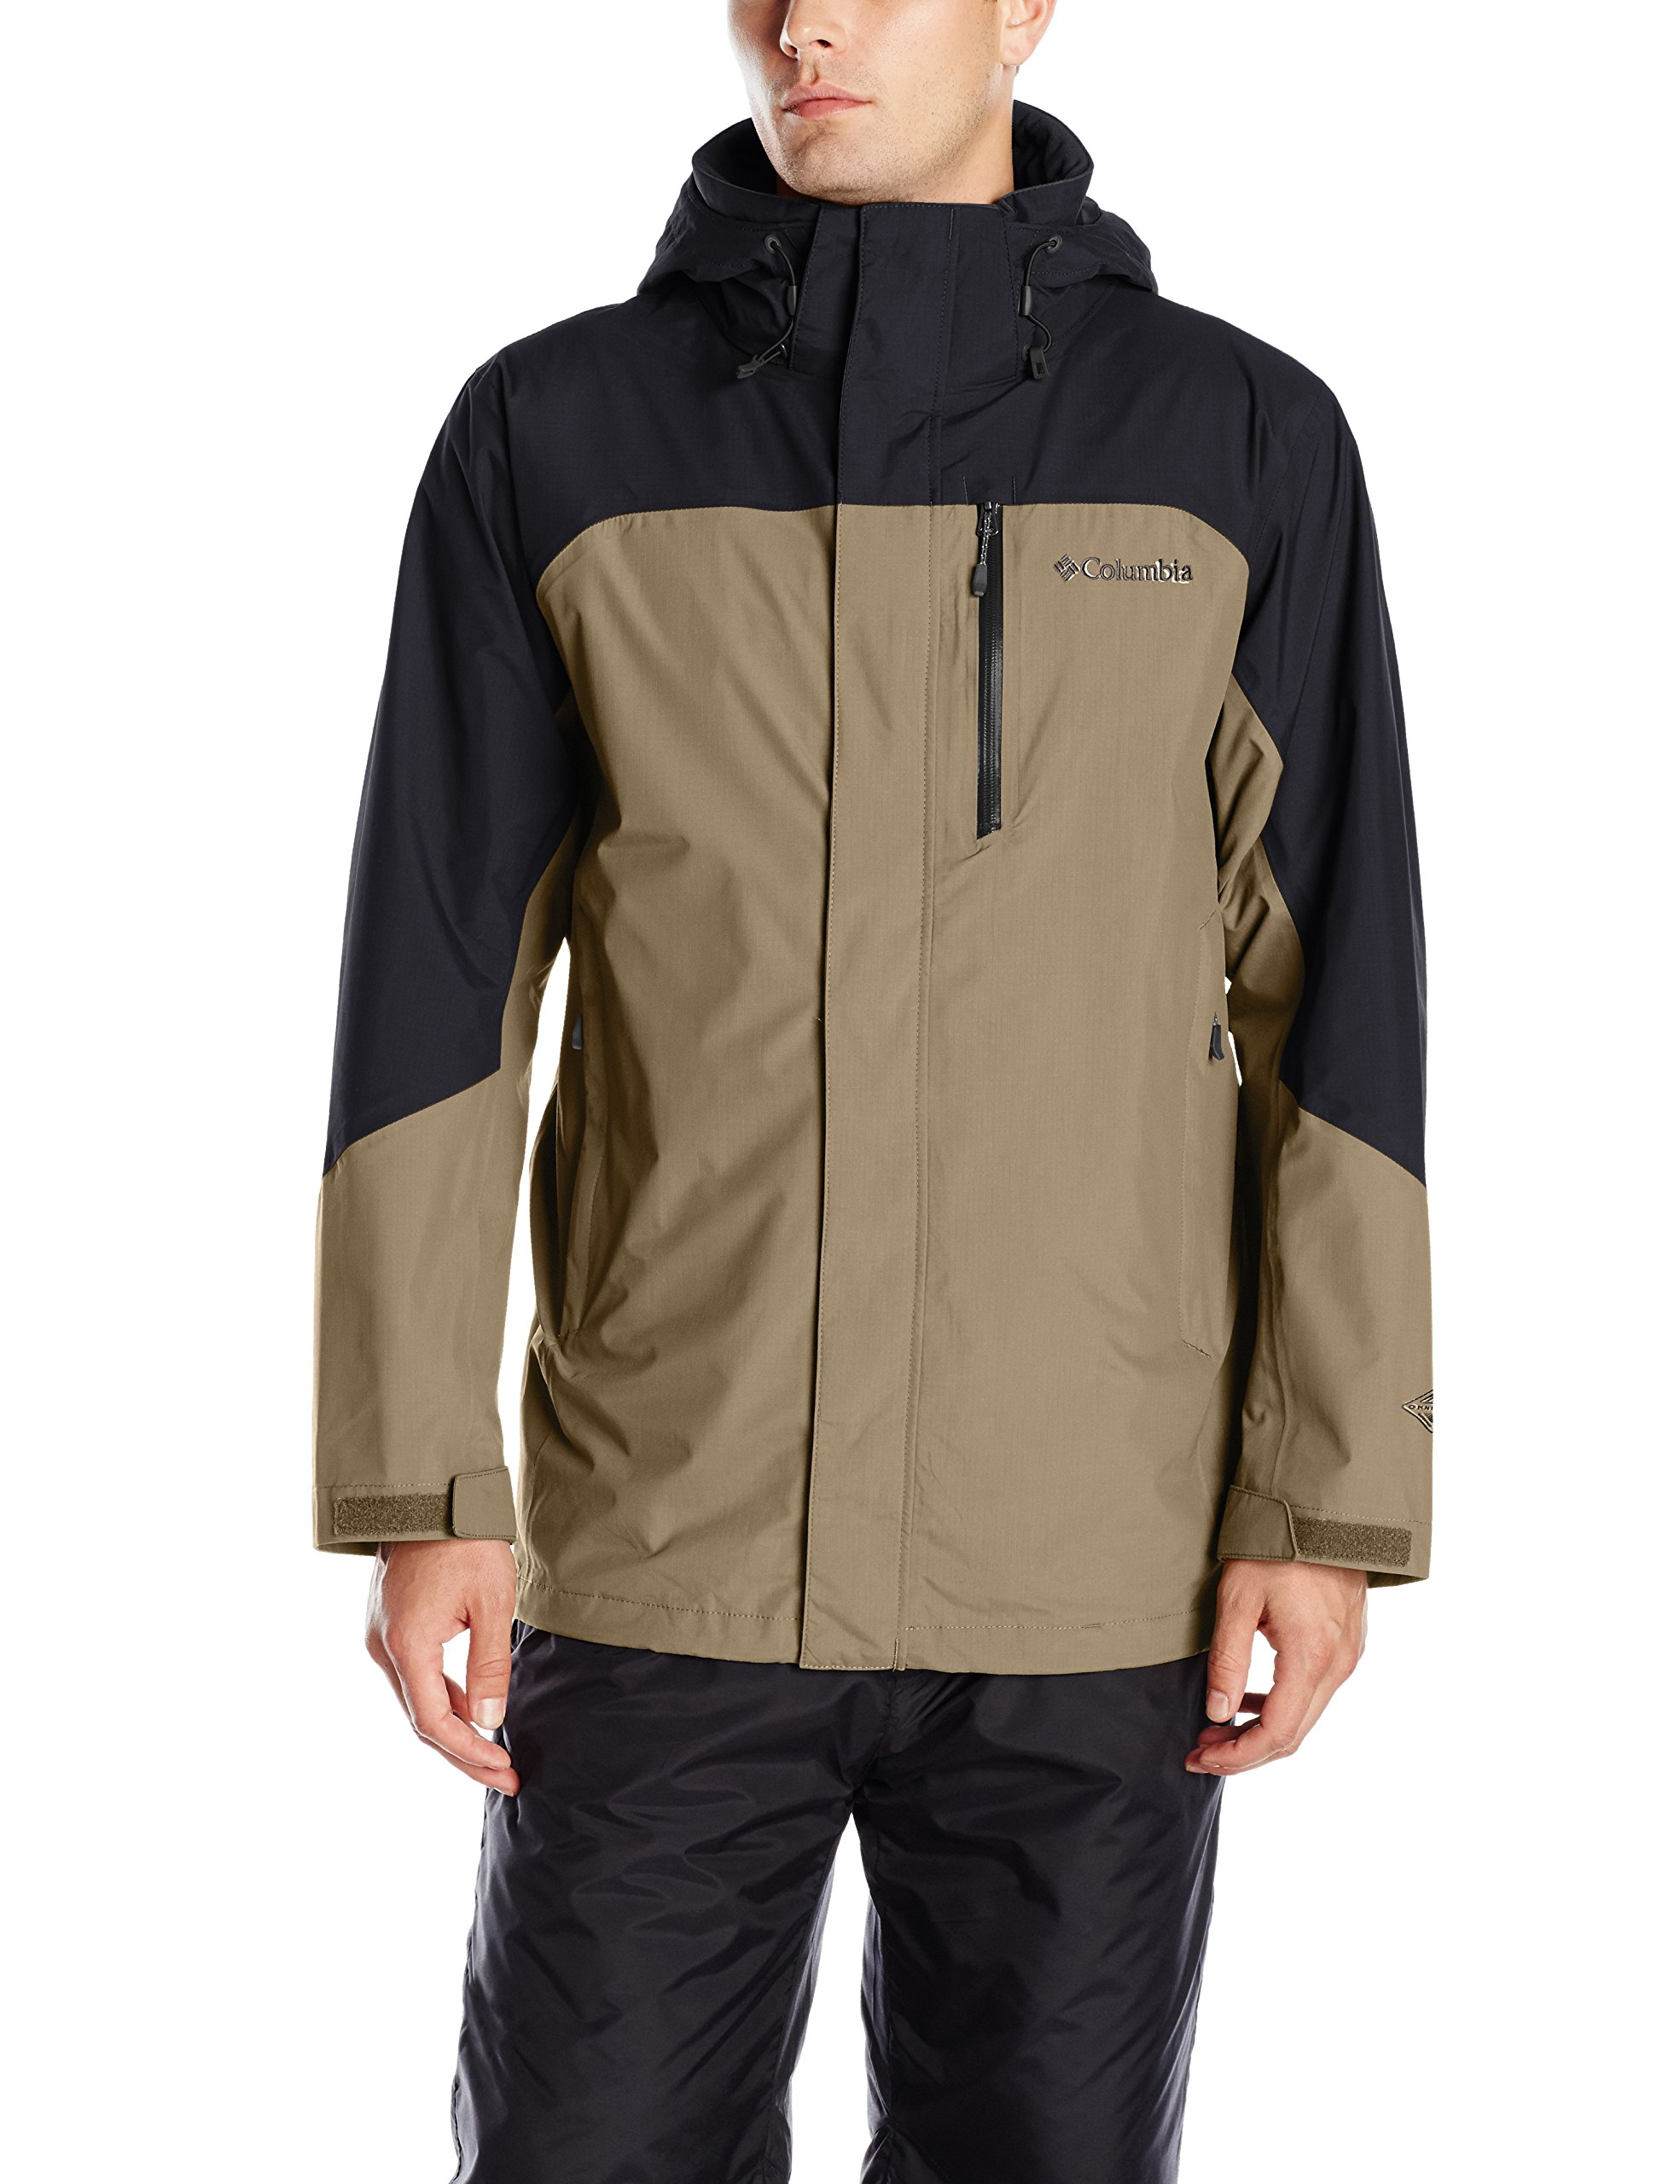 Columbia Men's Lhotse II Interchange Jacket, X-Large, Sage/Black by Columbia